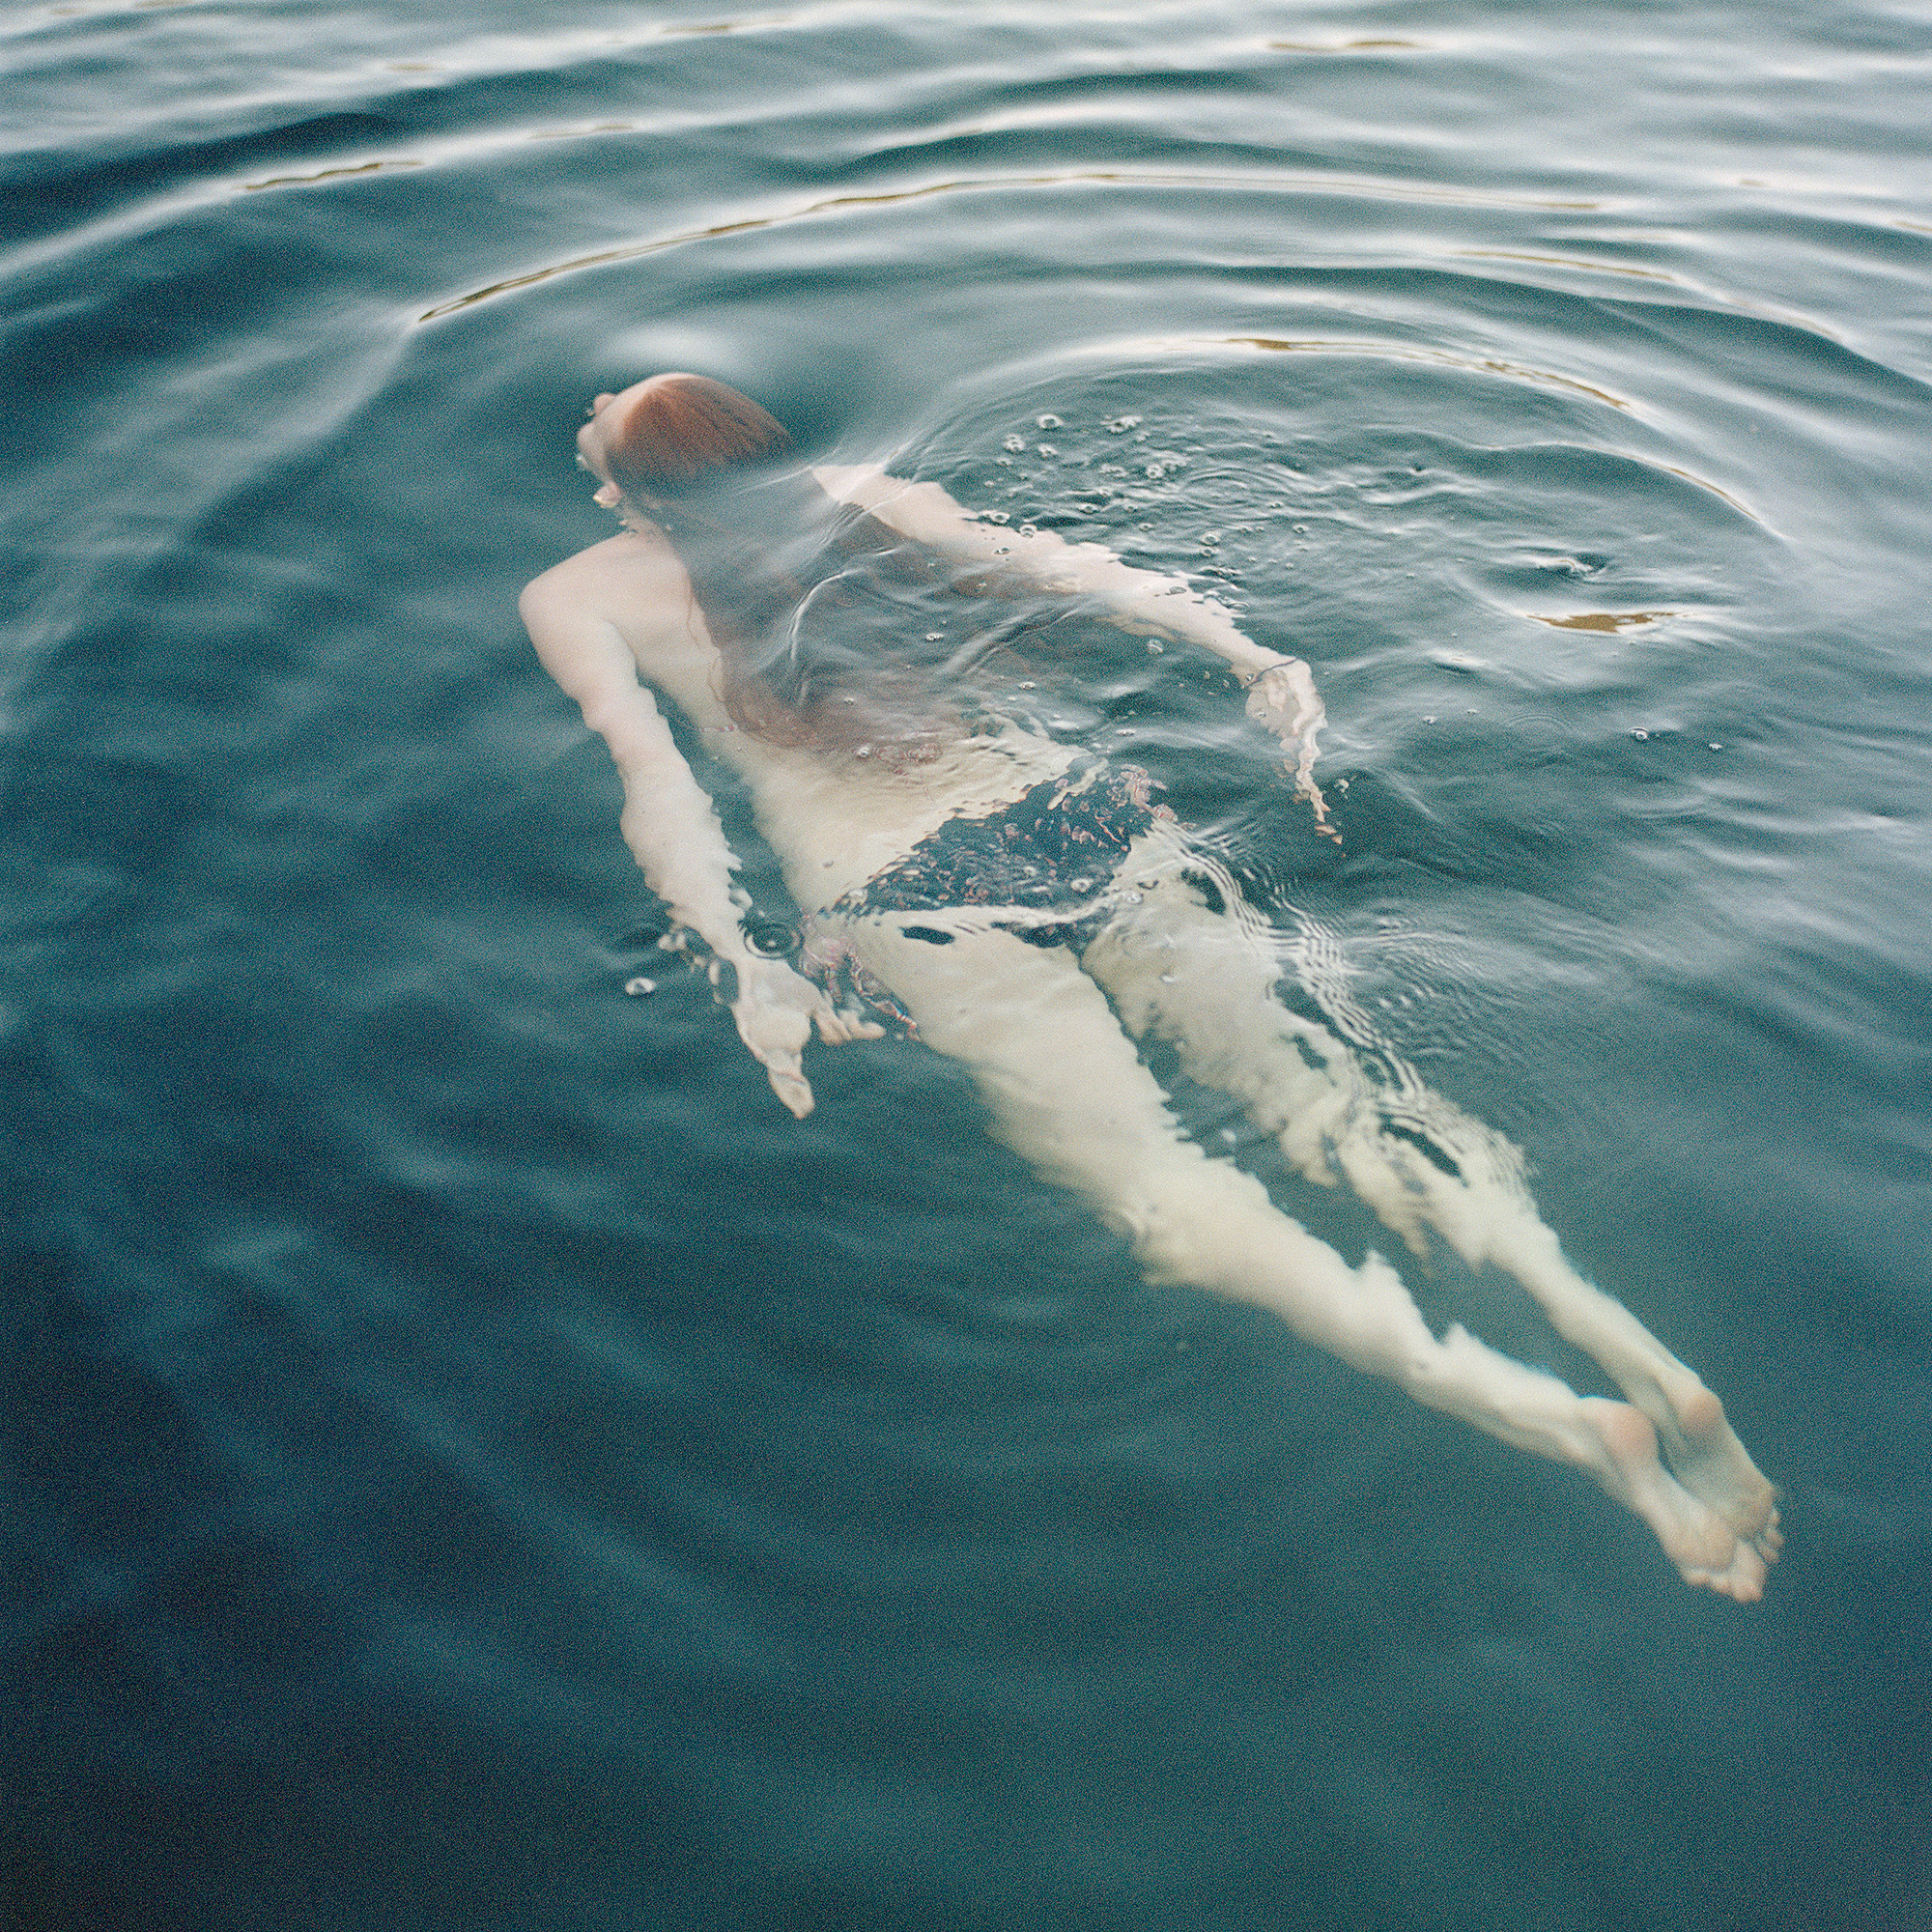 17_07_17_P_MCB_Underwater.jpg